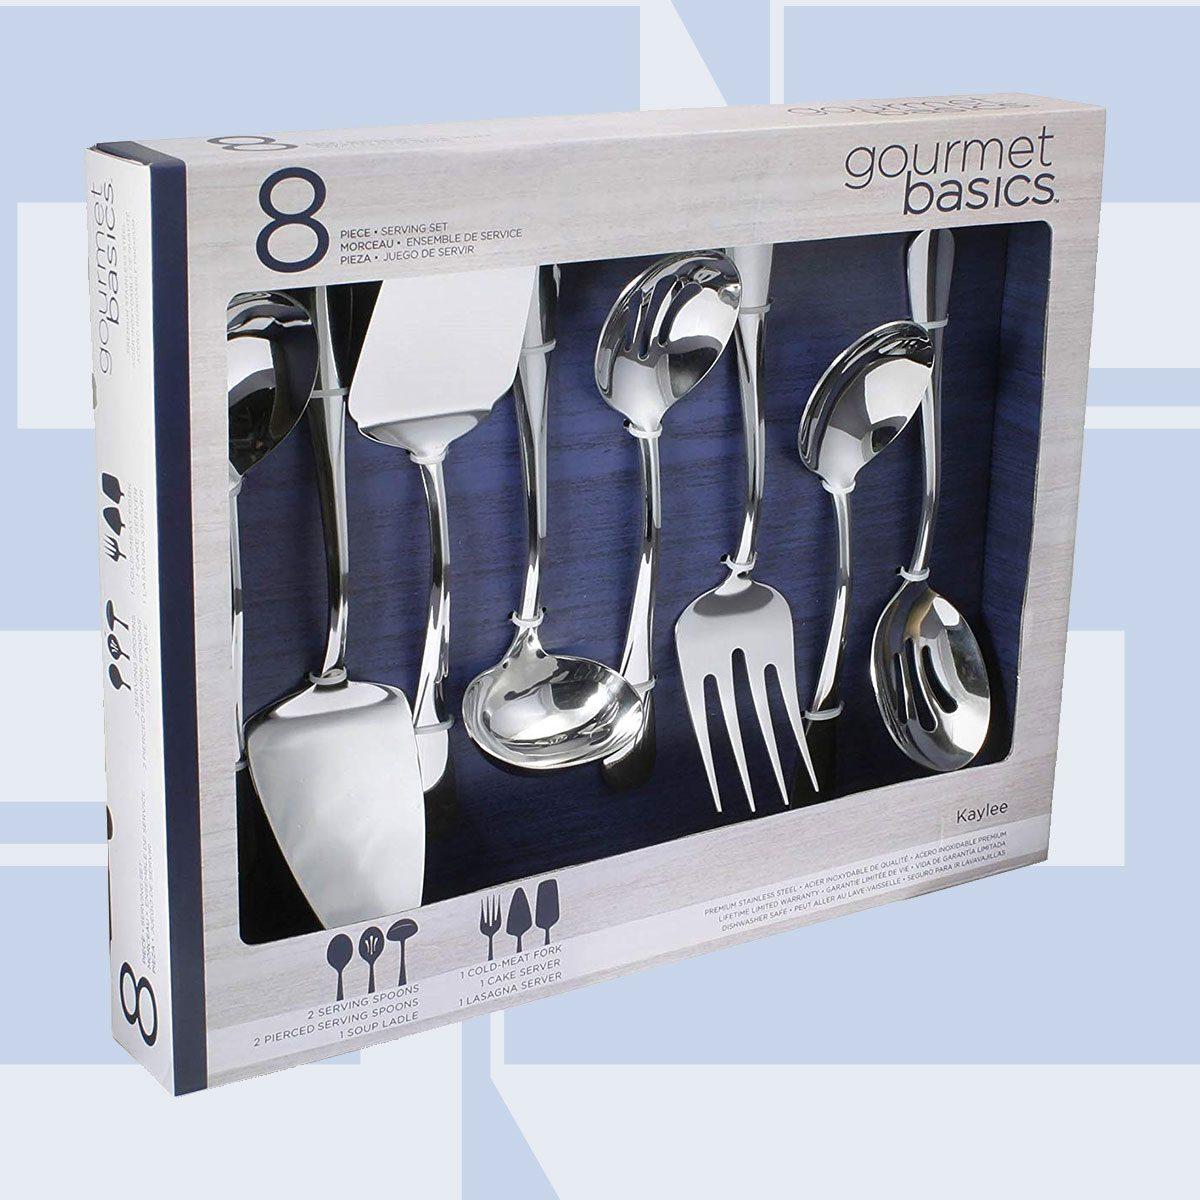 Gourmet Basics by Mikasa 5181046 Kaylee 8-Piece Stainless Steel Hostess Serving Utensil Set